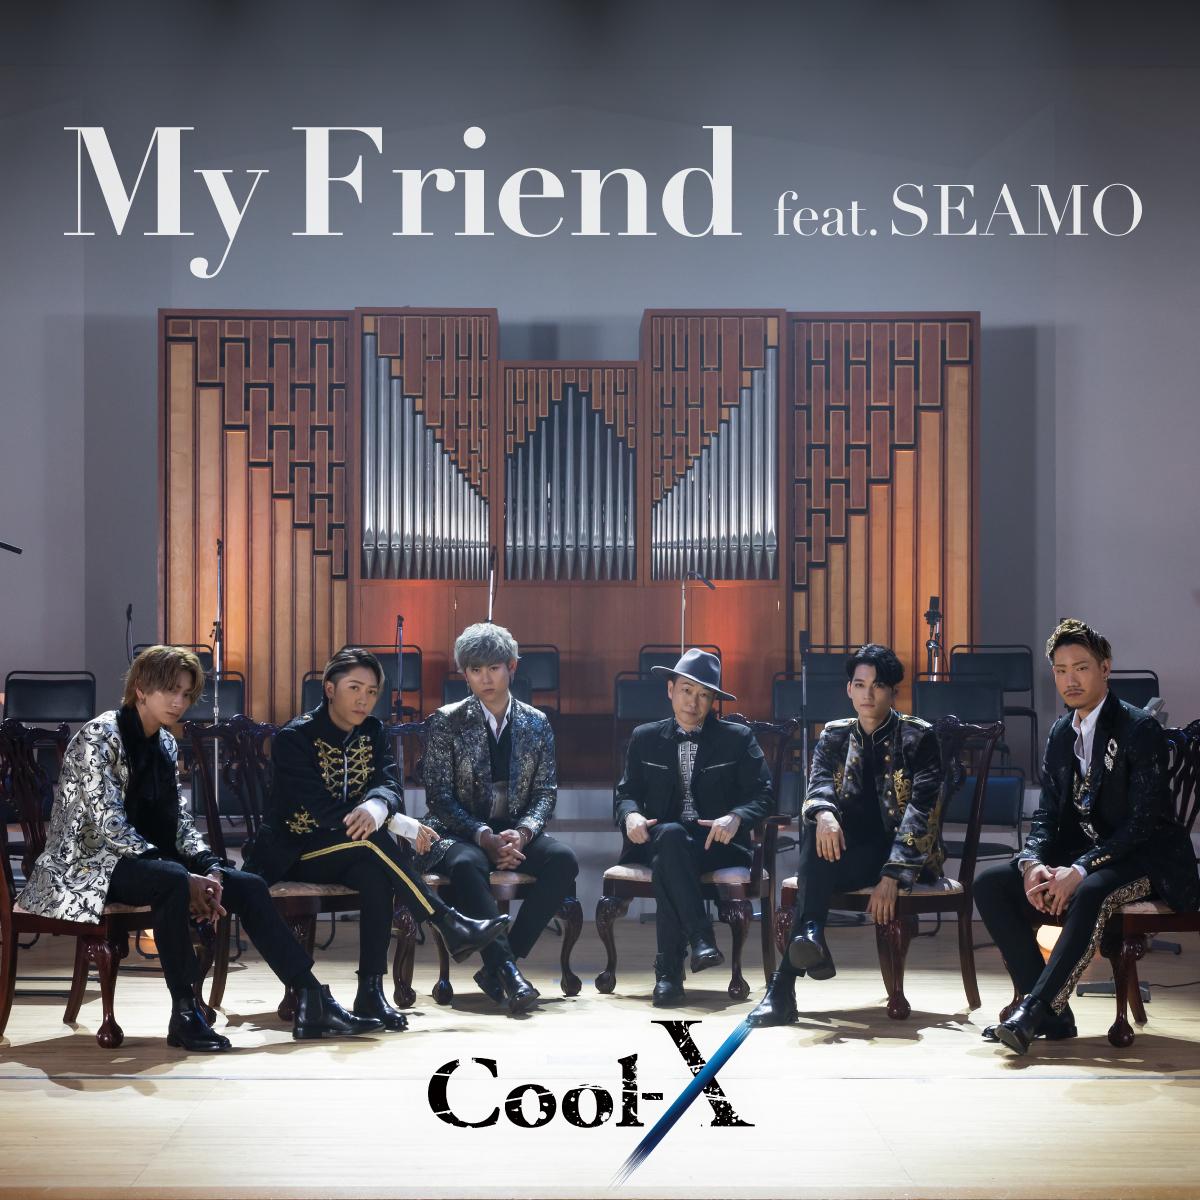 My Friend feat.SEAMO